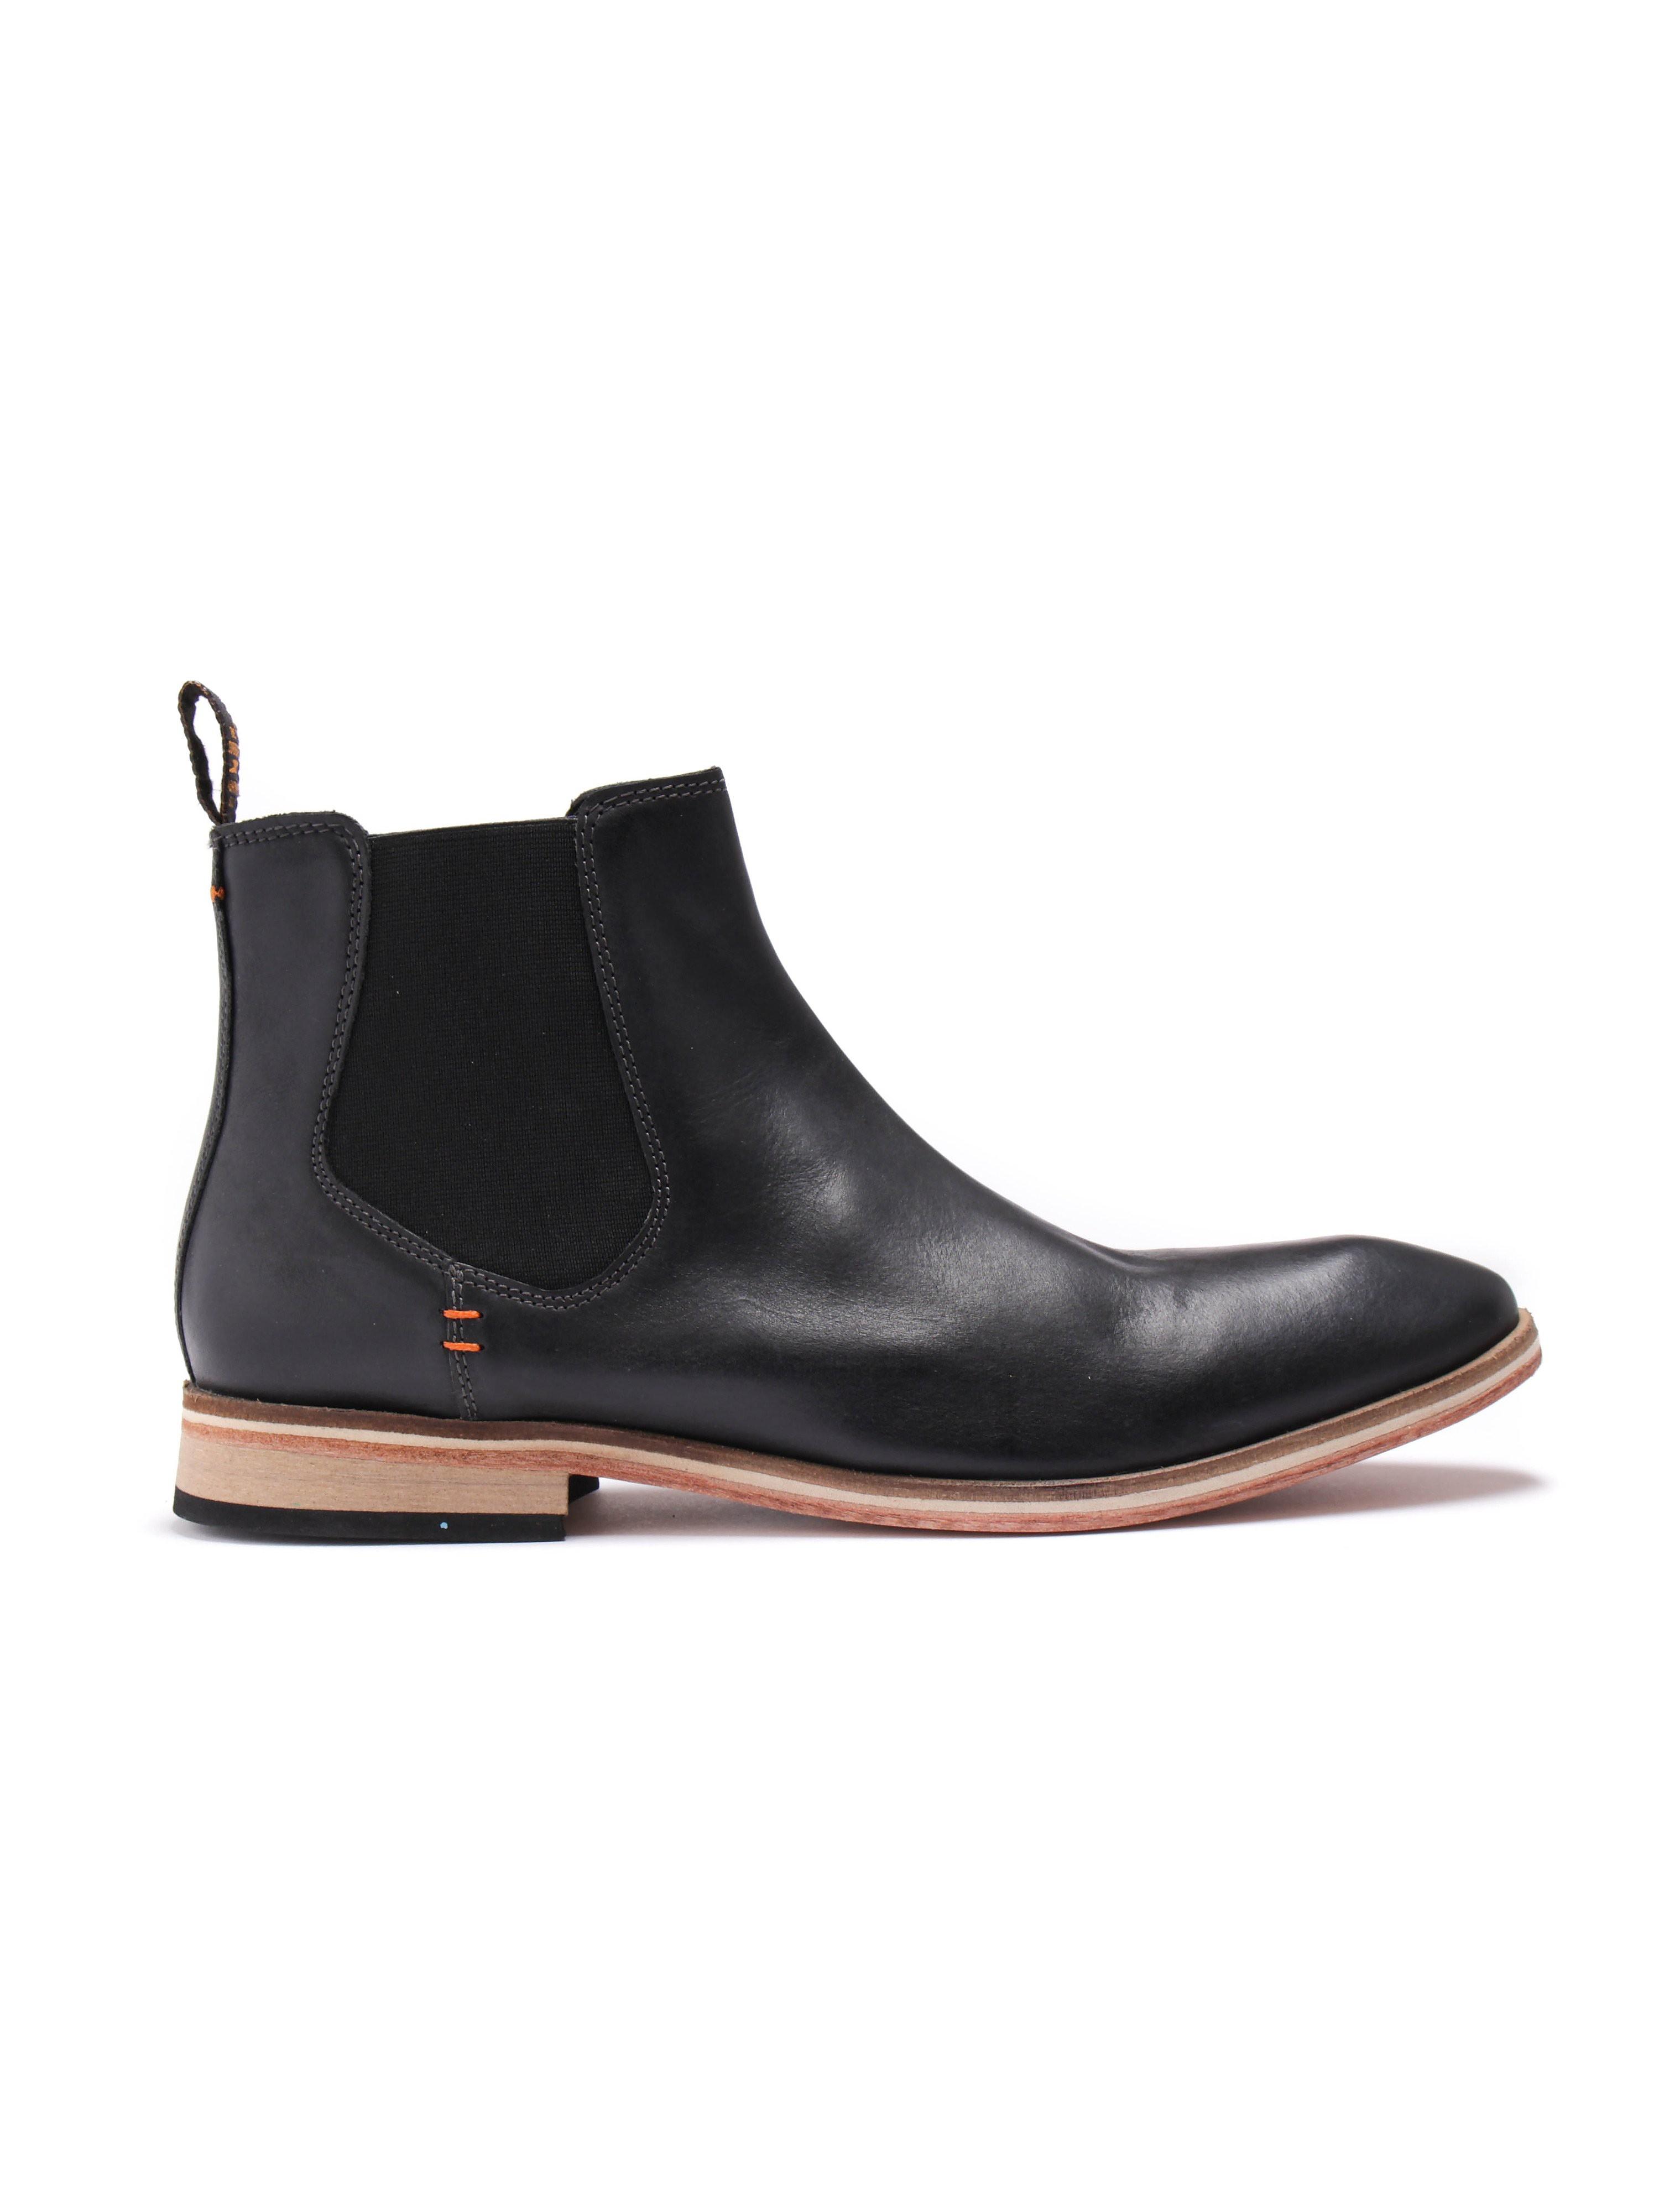 Superdry Premium Meteor Chelsea Boot - Black